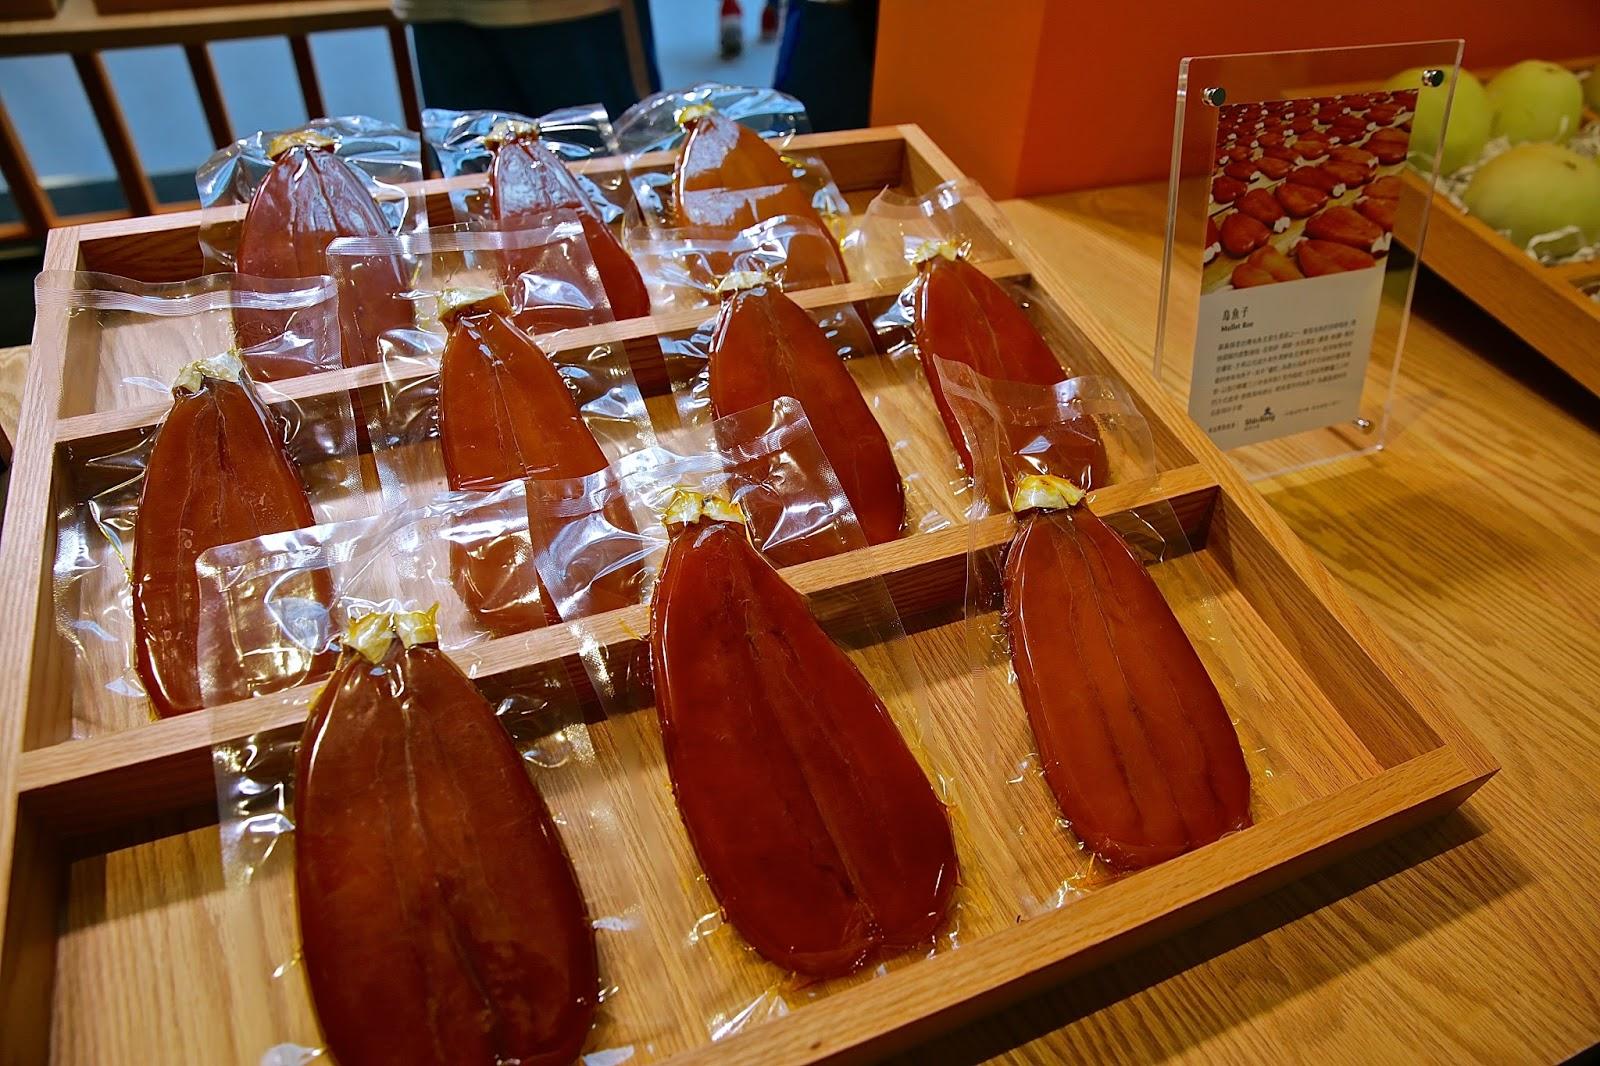 The London Foodie: Discovering Foodie Taiwan – A Gastronomic Week in ...